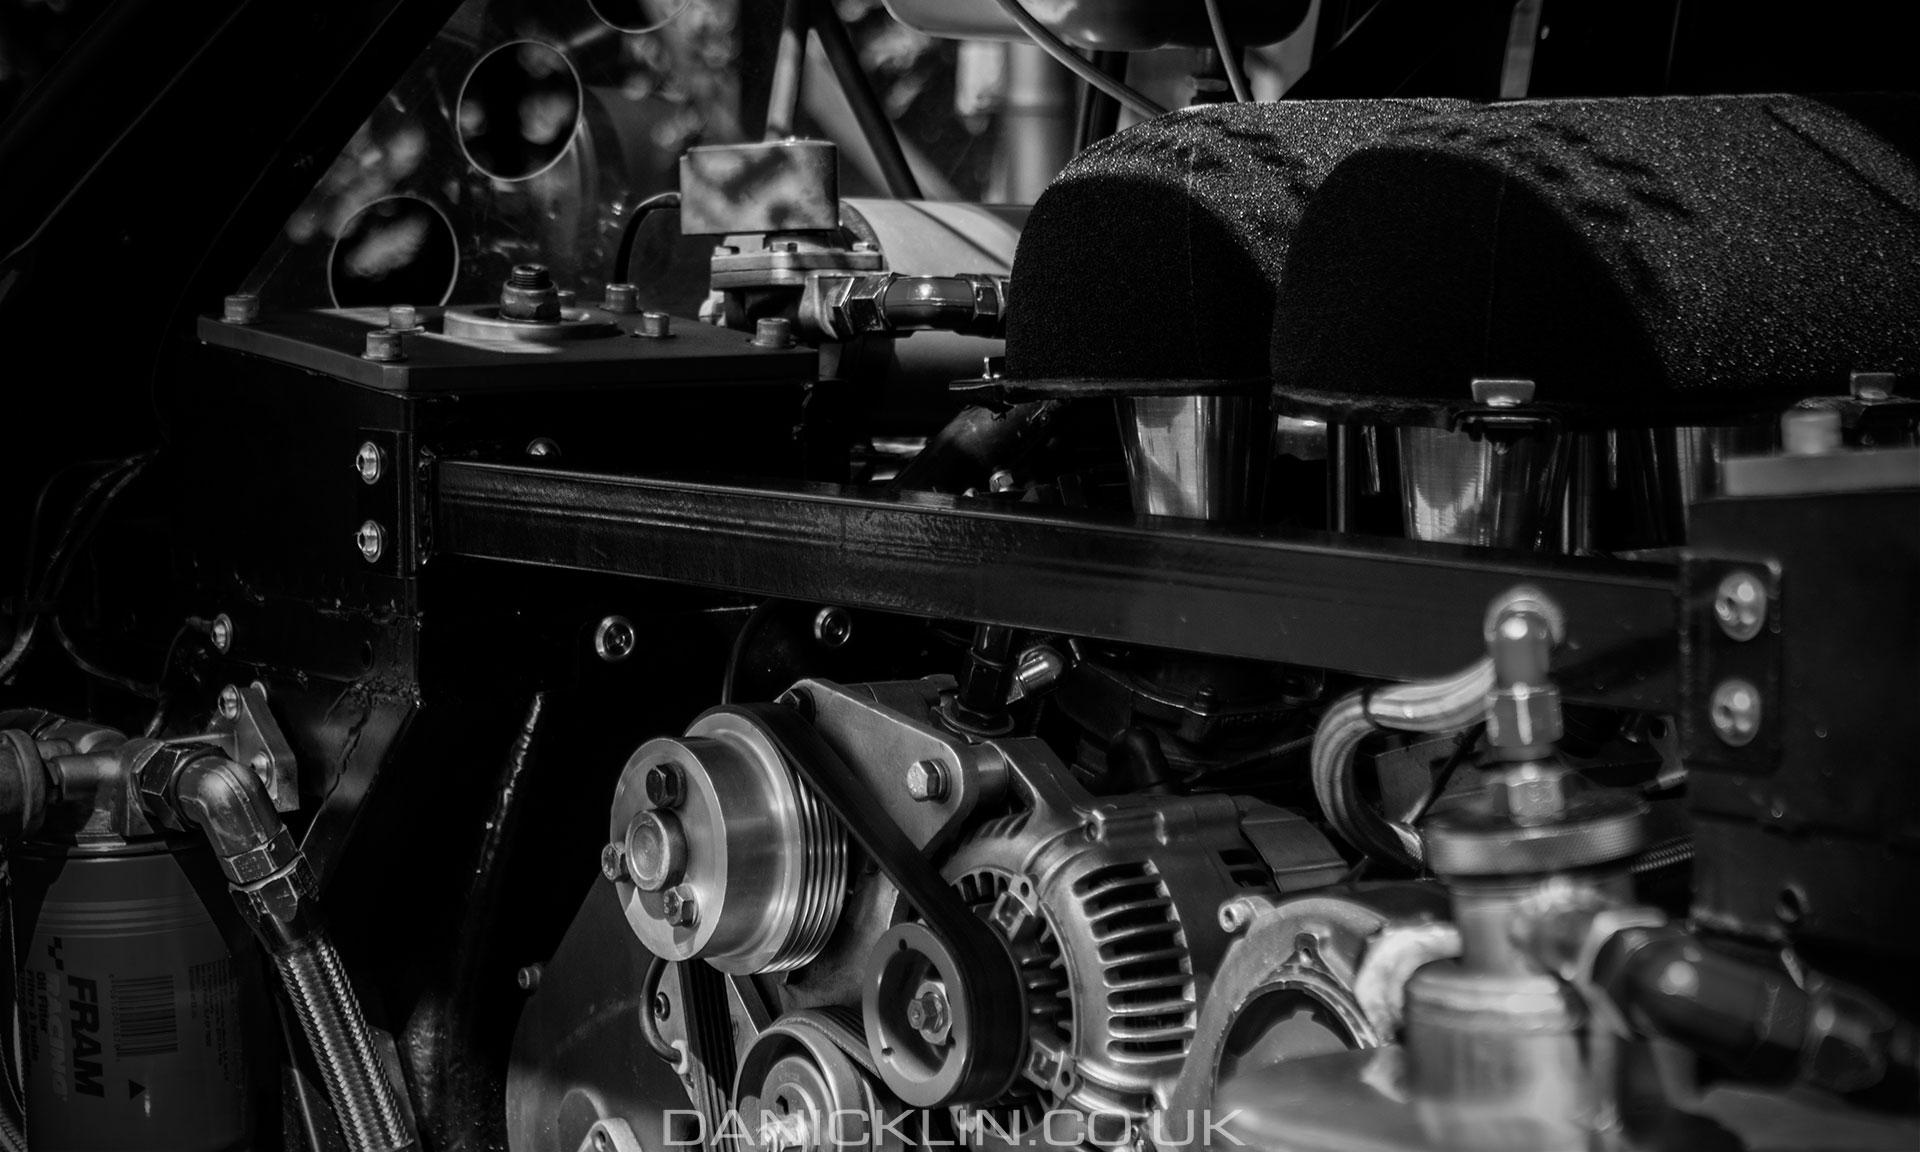 Rear engine bay showing the impressive 3L block